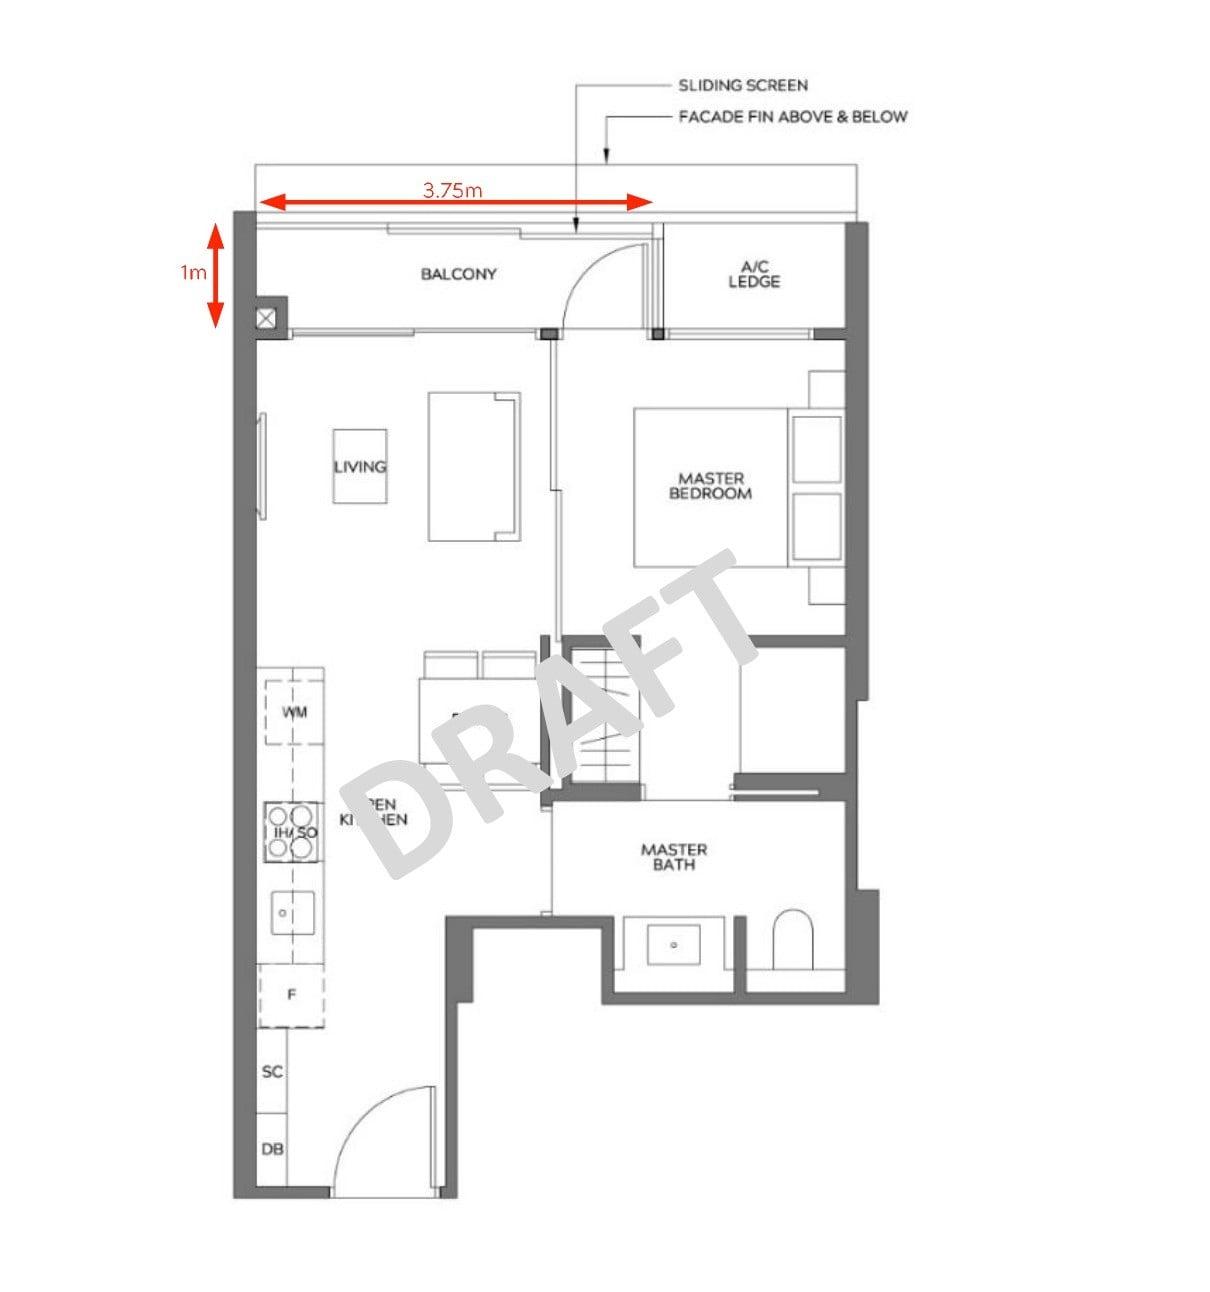 Meyer-Mansion-1BR type A1